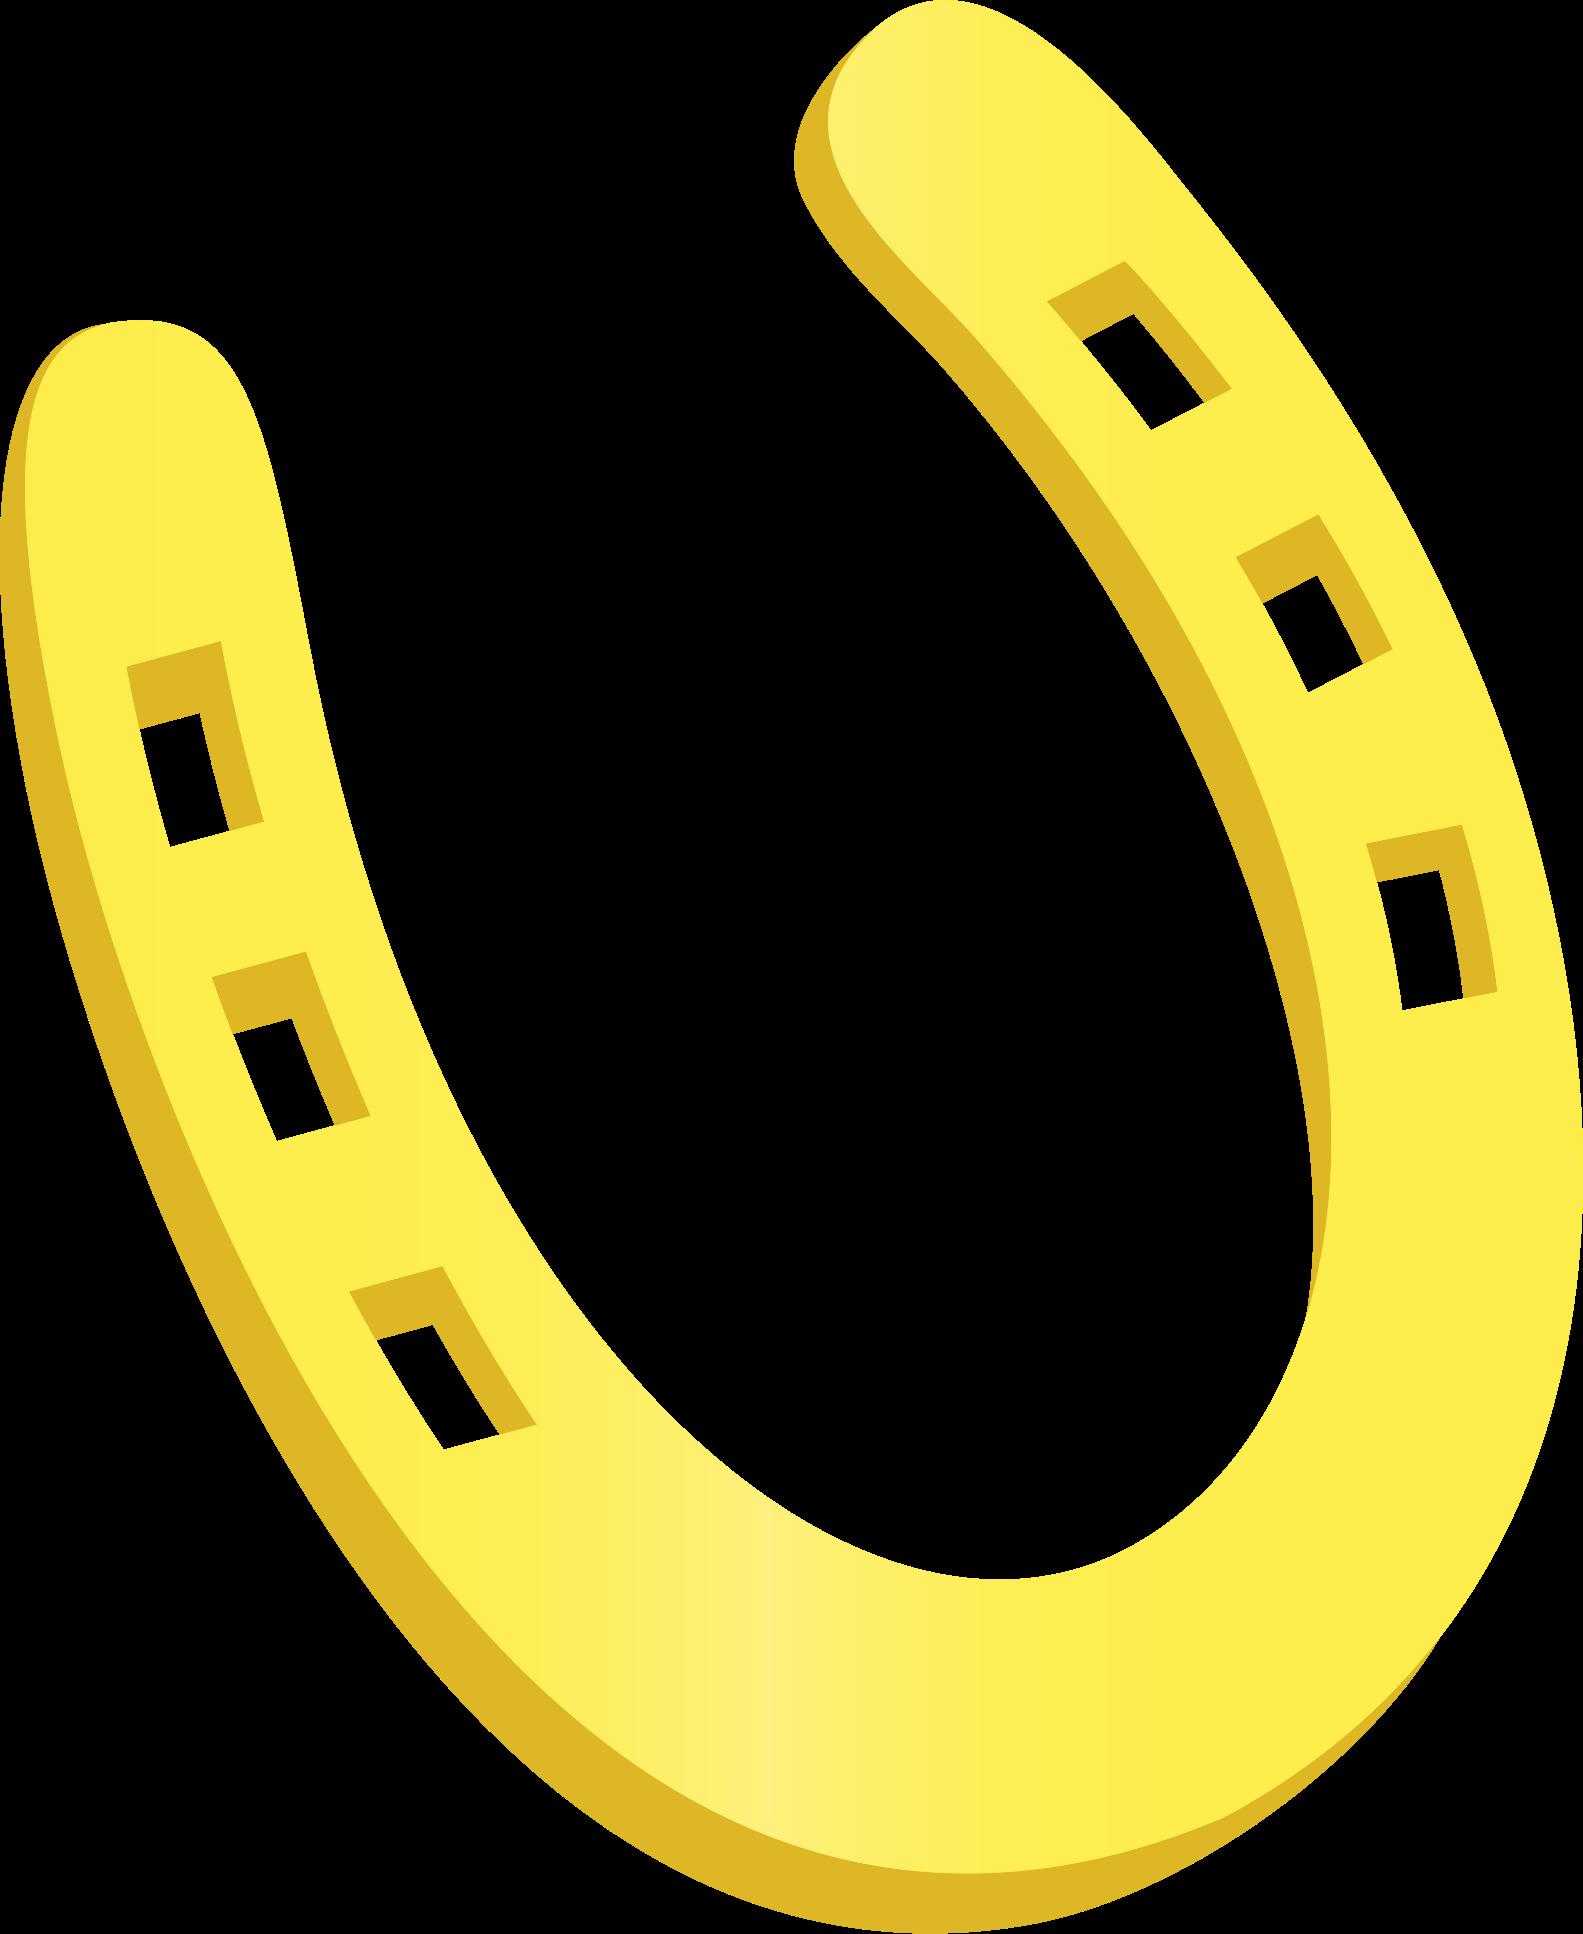 Horse shoe clipart horseshoe